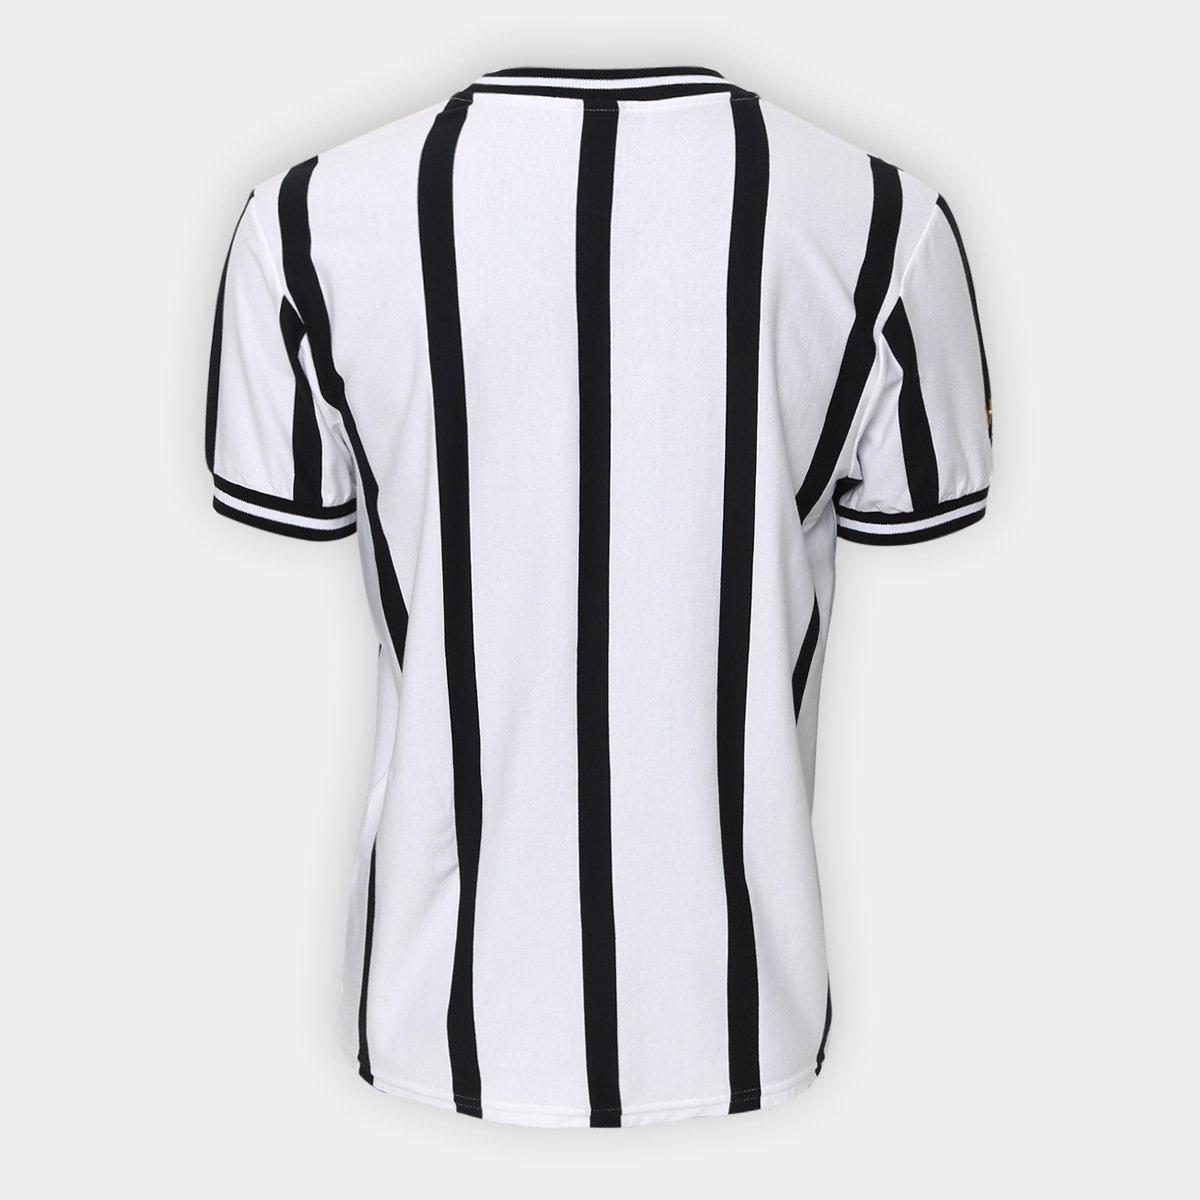 Camiseta Corinthians Réplica 1971 Masculina  Camiseta Corinthians Réplica  1971 Masculina ... 1bac2697a8f49